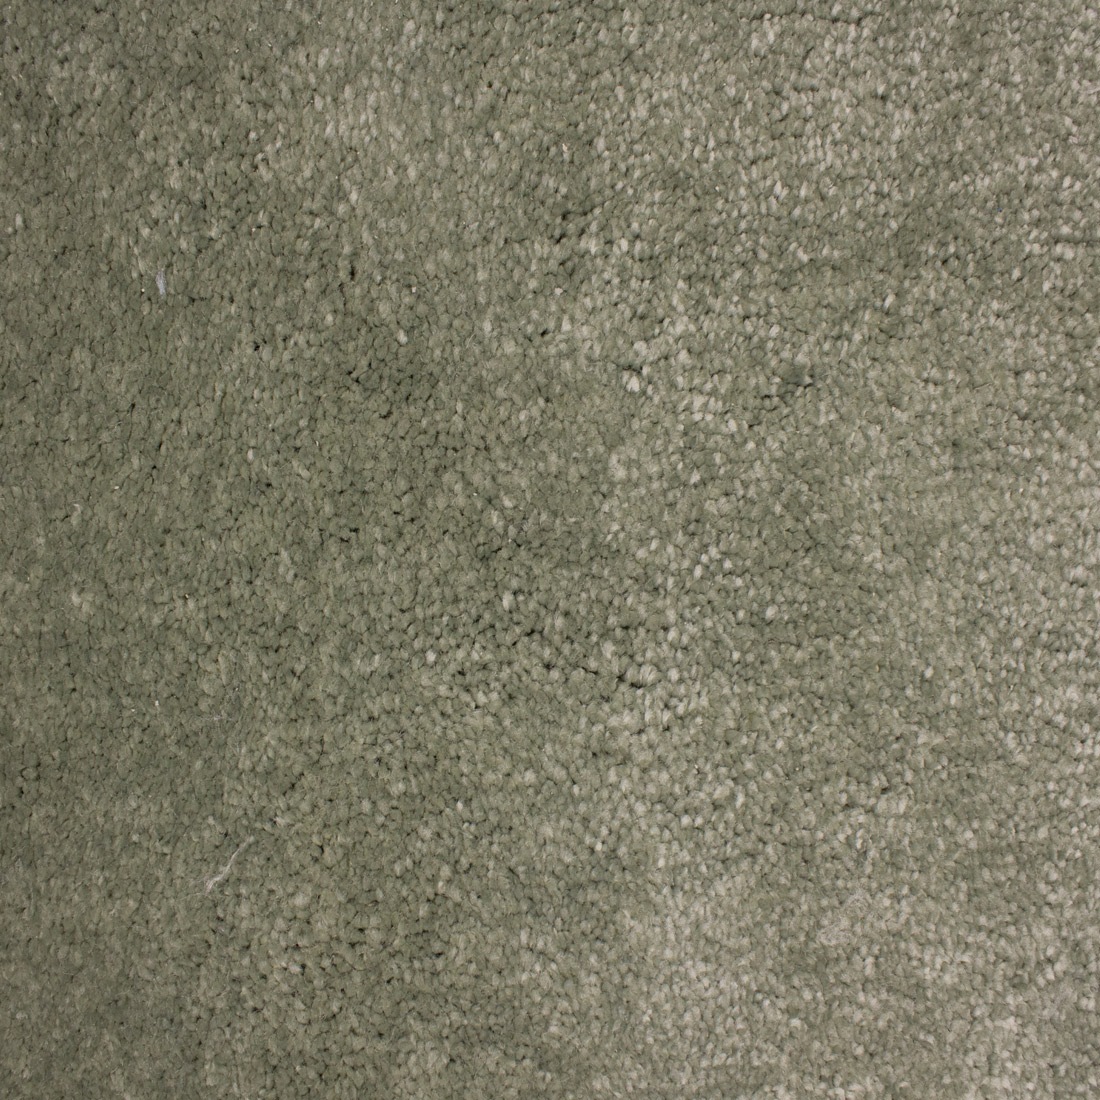 Vloerkleed Xilento Soft Pistache